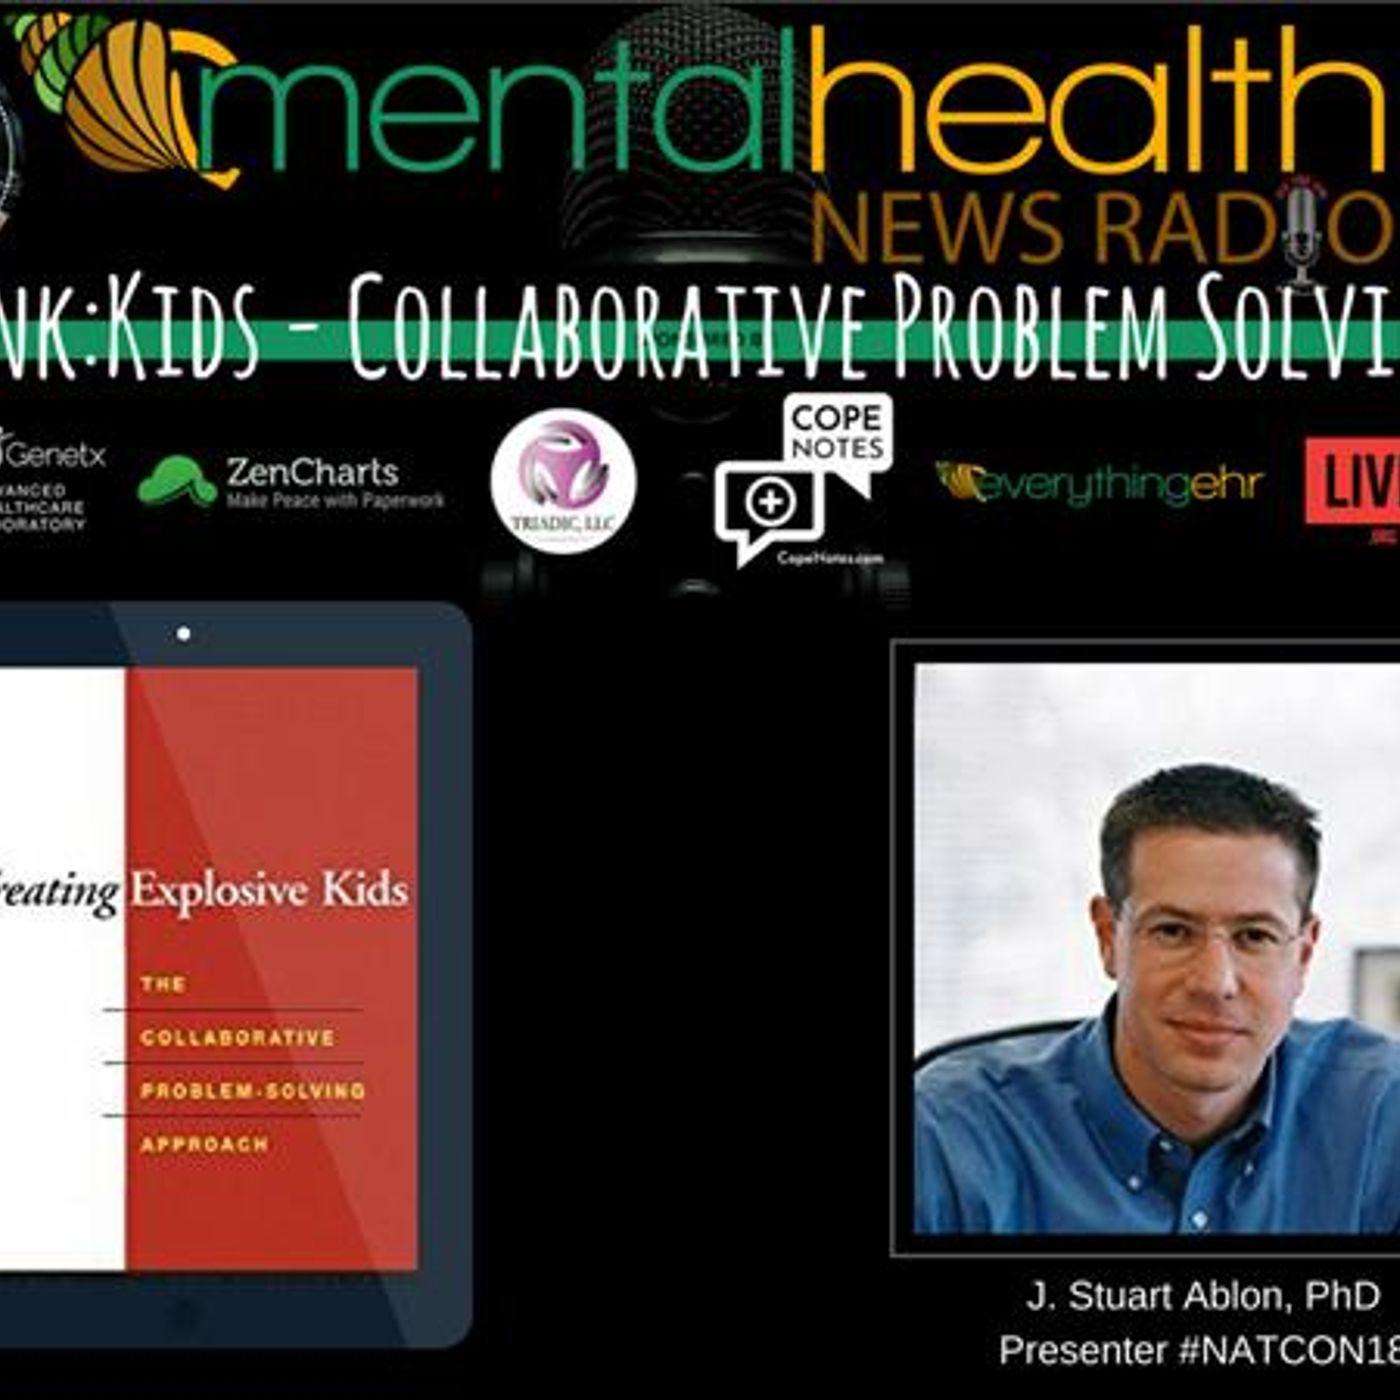 Mental Health News Radio - Think:Kids - Collaborative Problem Solving with Dr. J. Stuart Ablon